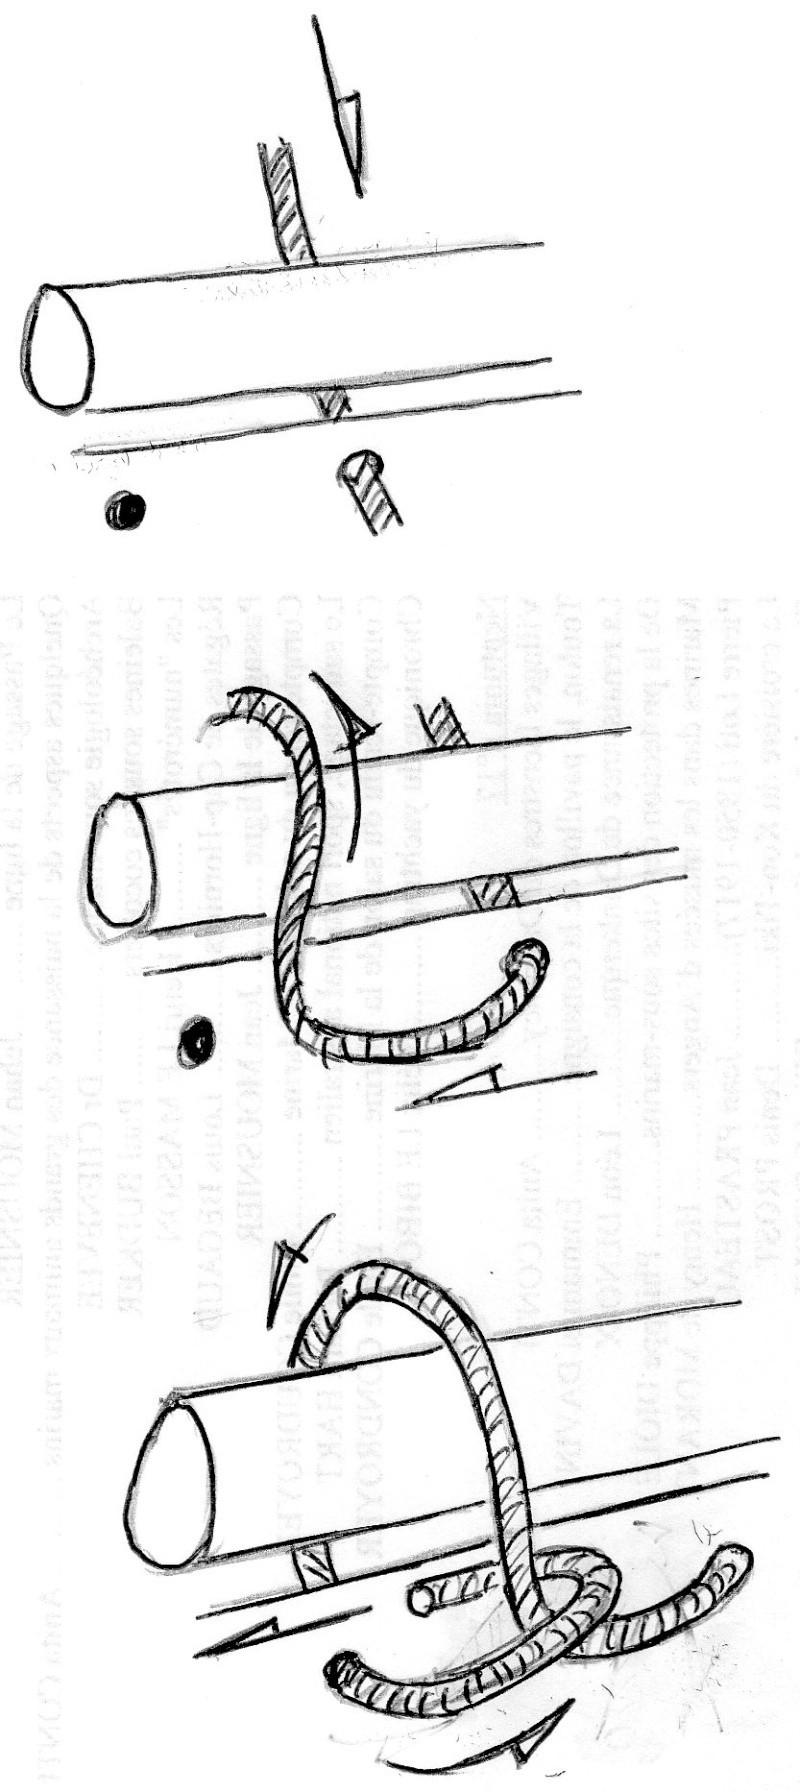 BLUENOSE II (ARTESANIA LATINA) 1/75 - Page 3 Img74910